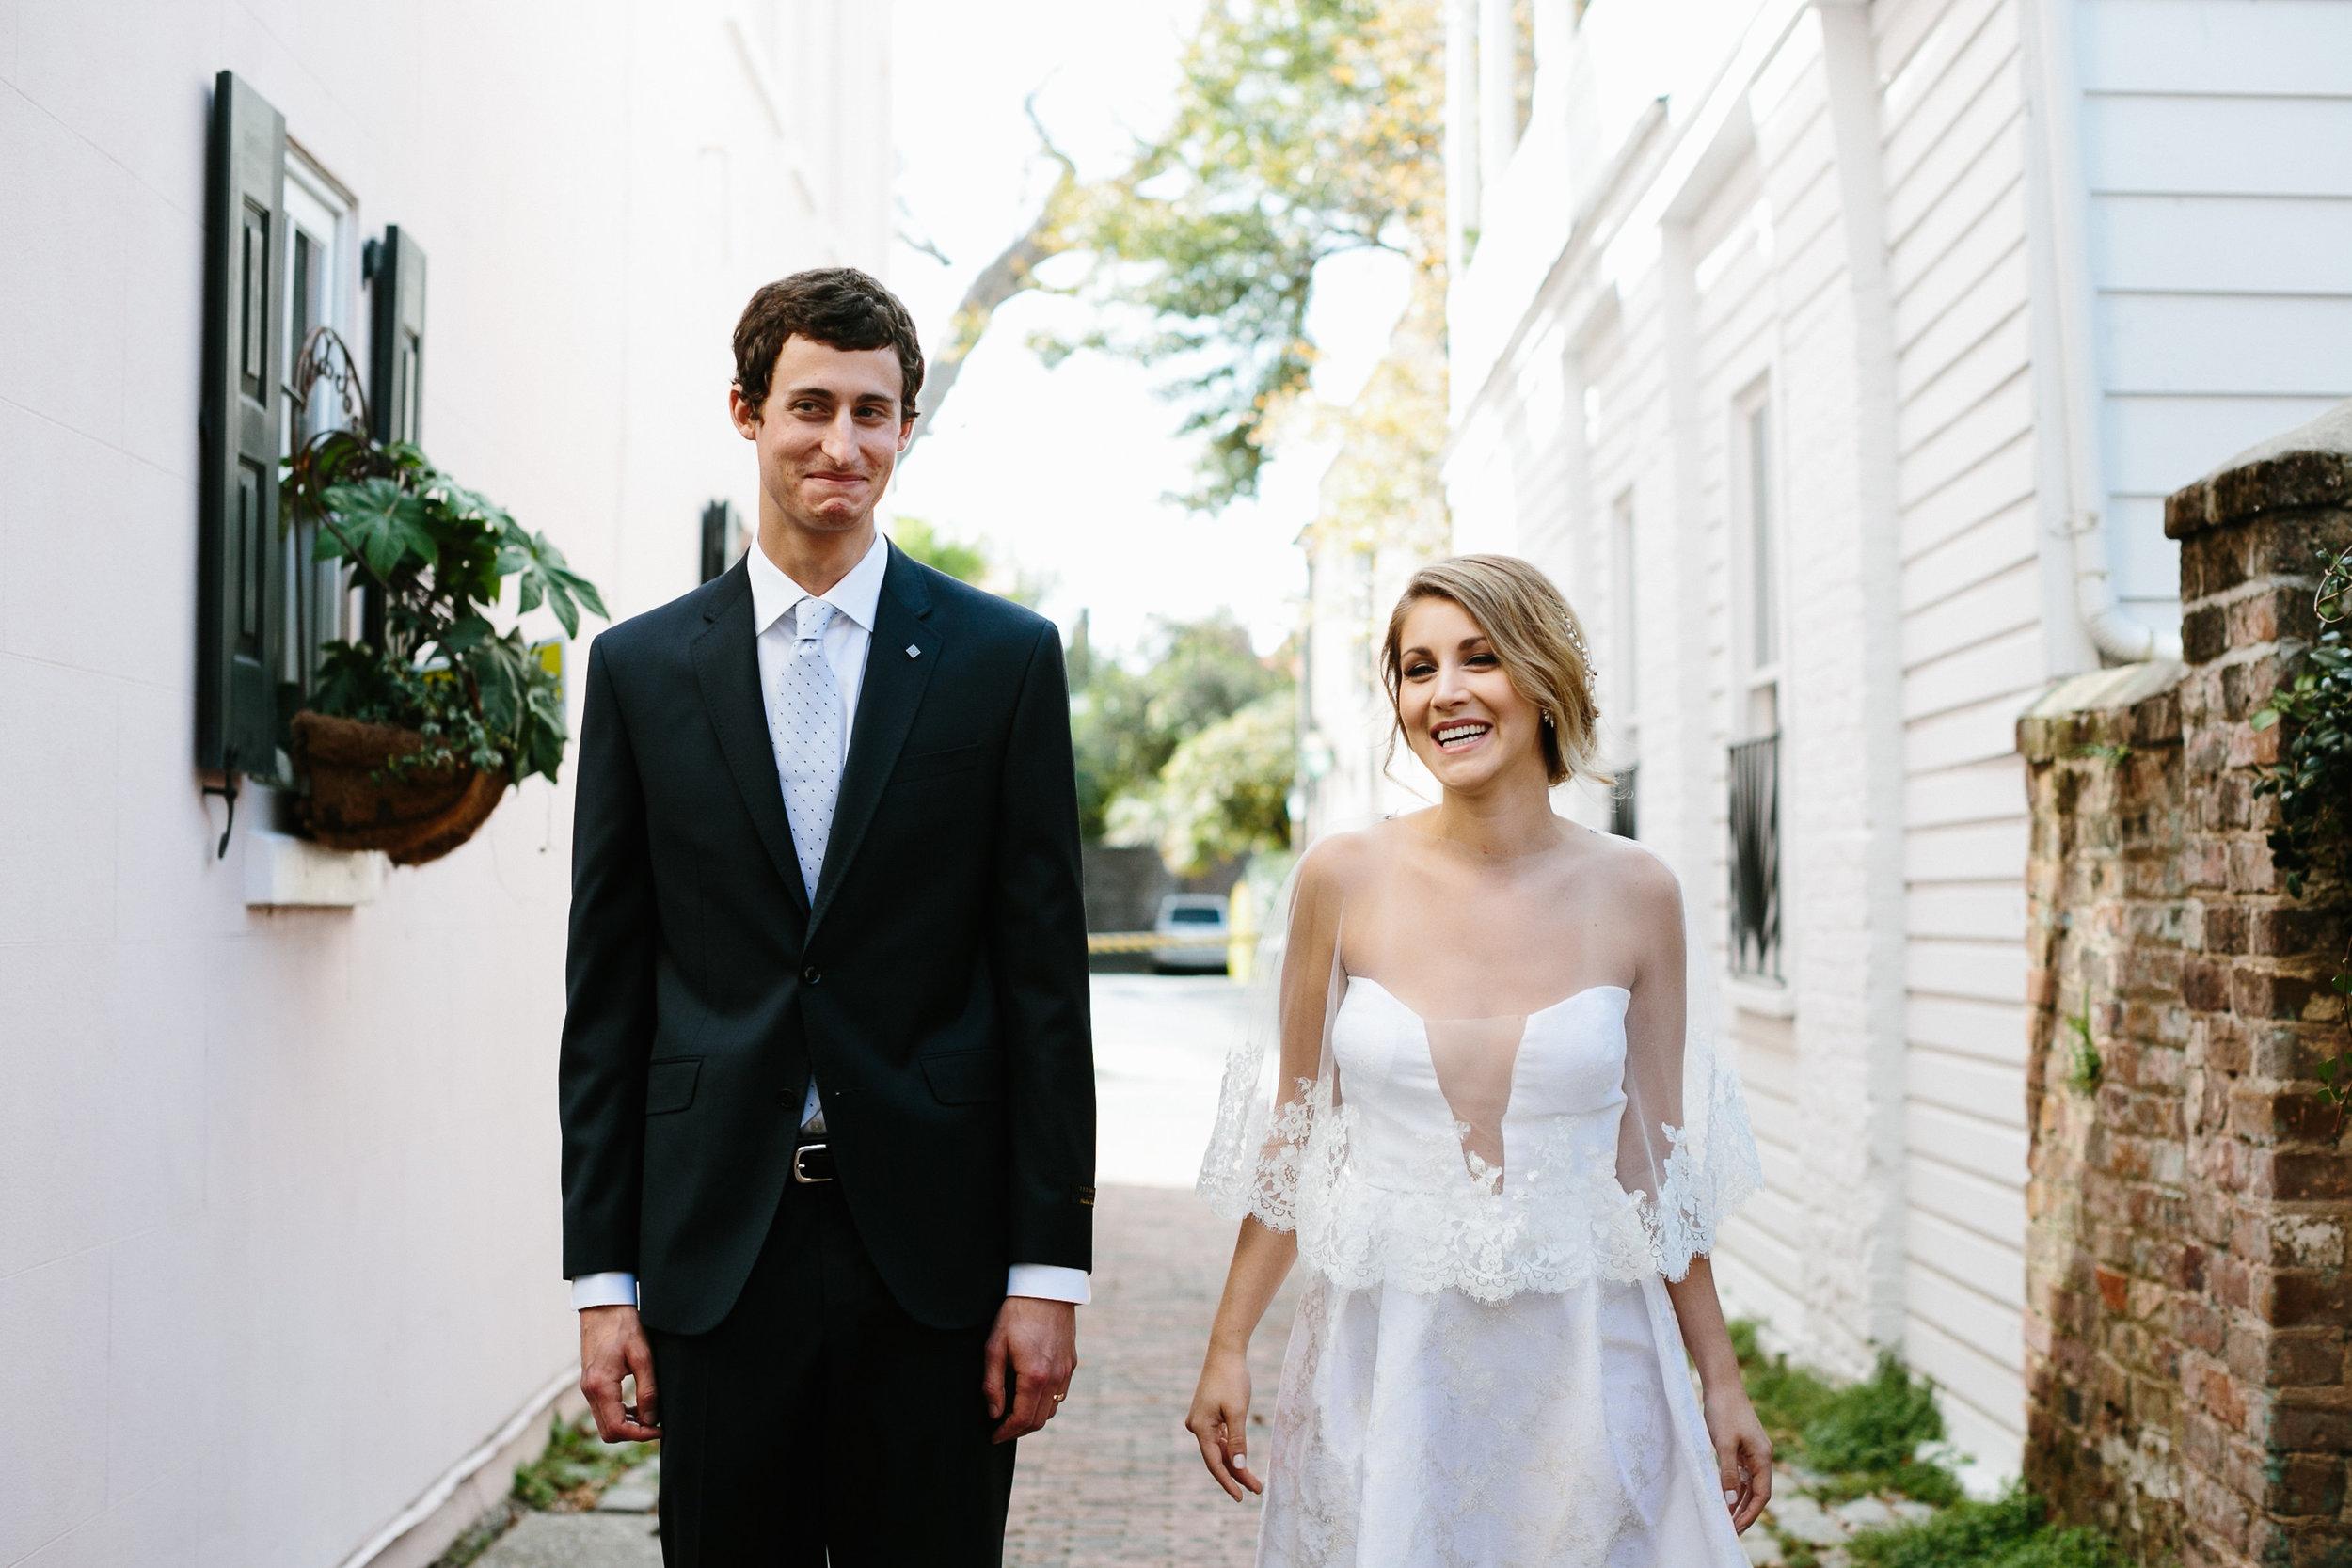 charleston-wedding-elopement-25.jpg